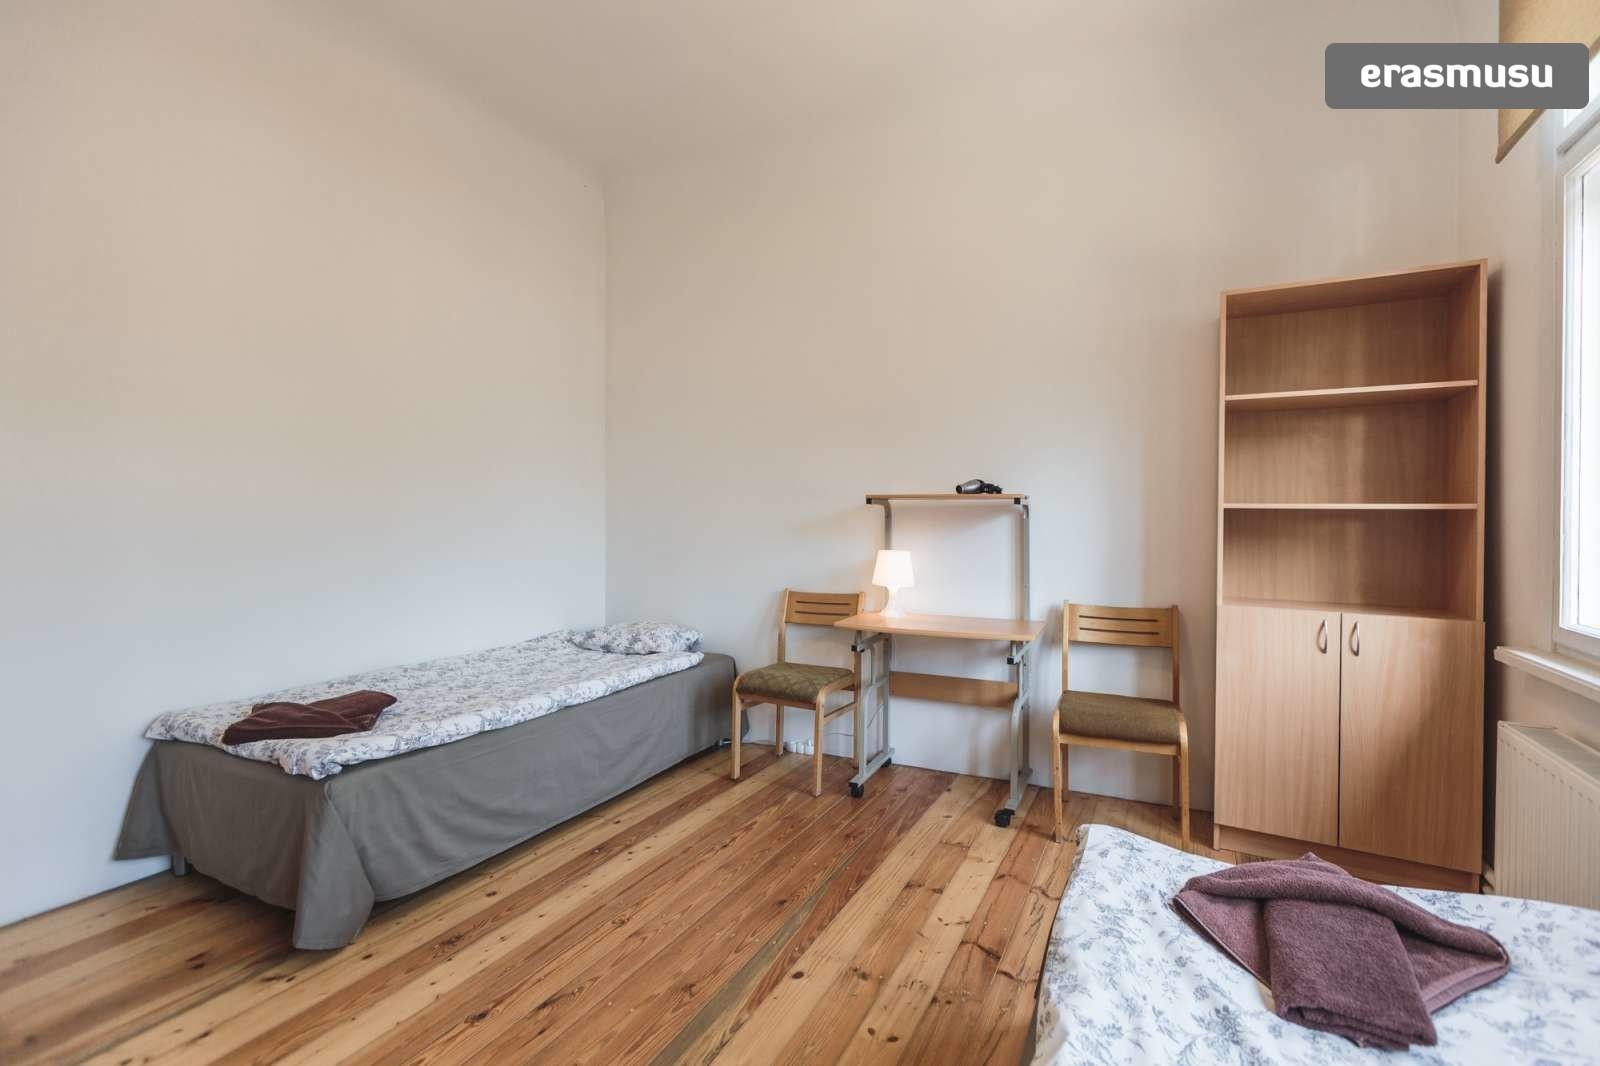 stylish-studio-apartment-rent-agenskalns-pet-friendly-3b63a34141